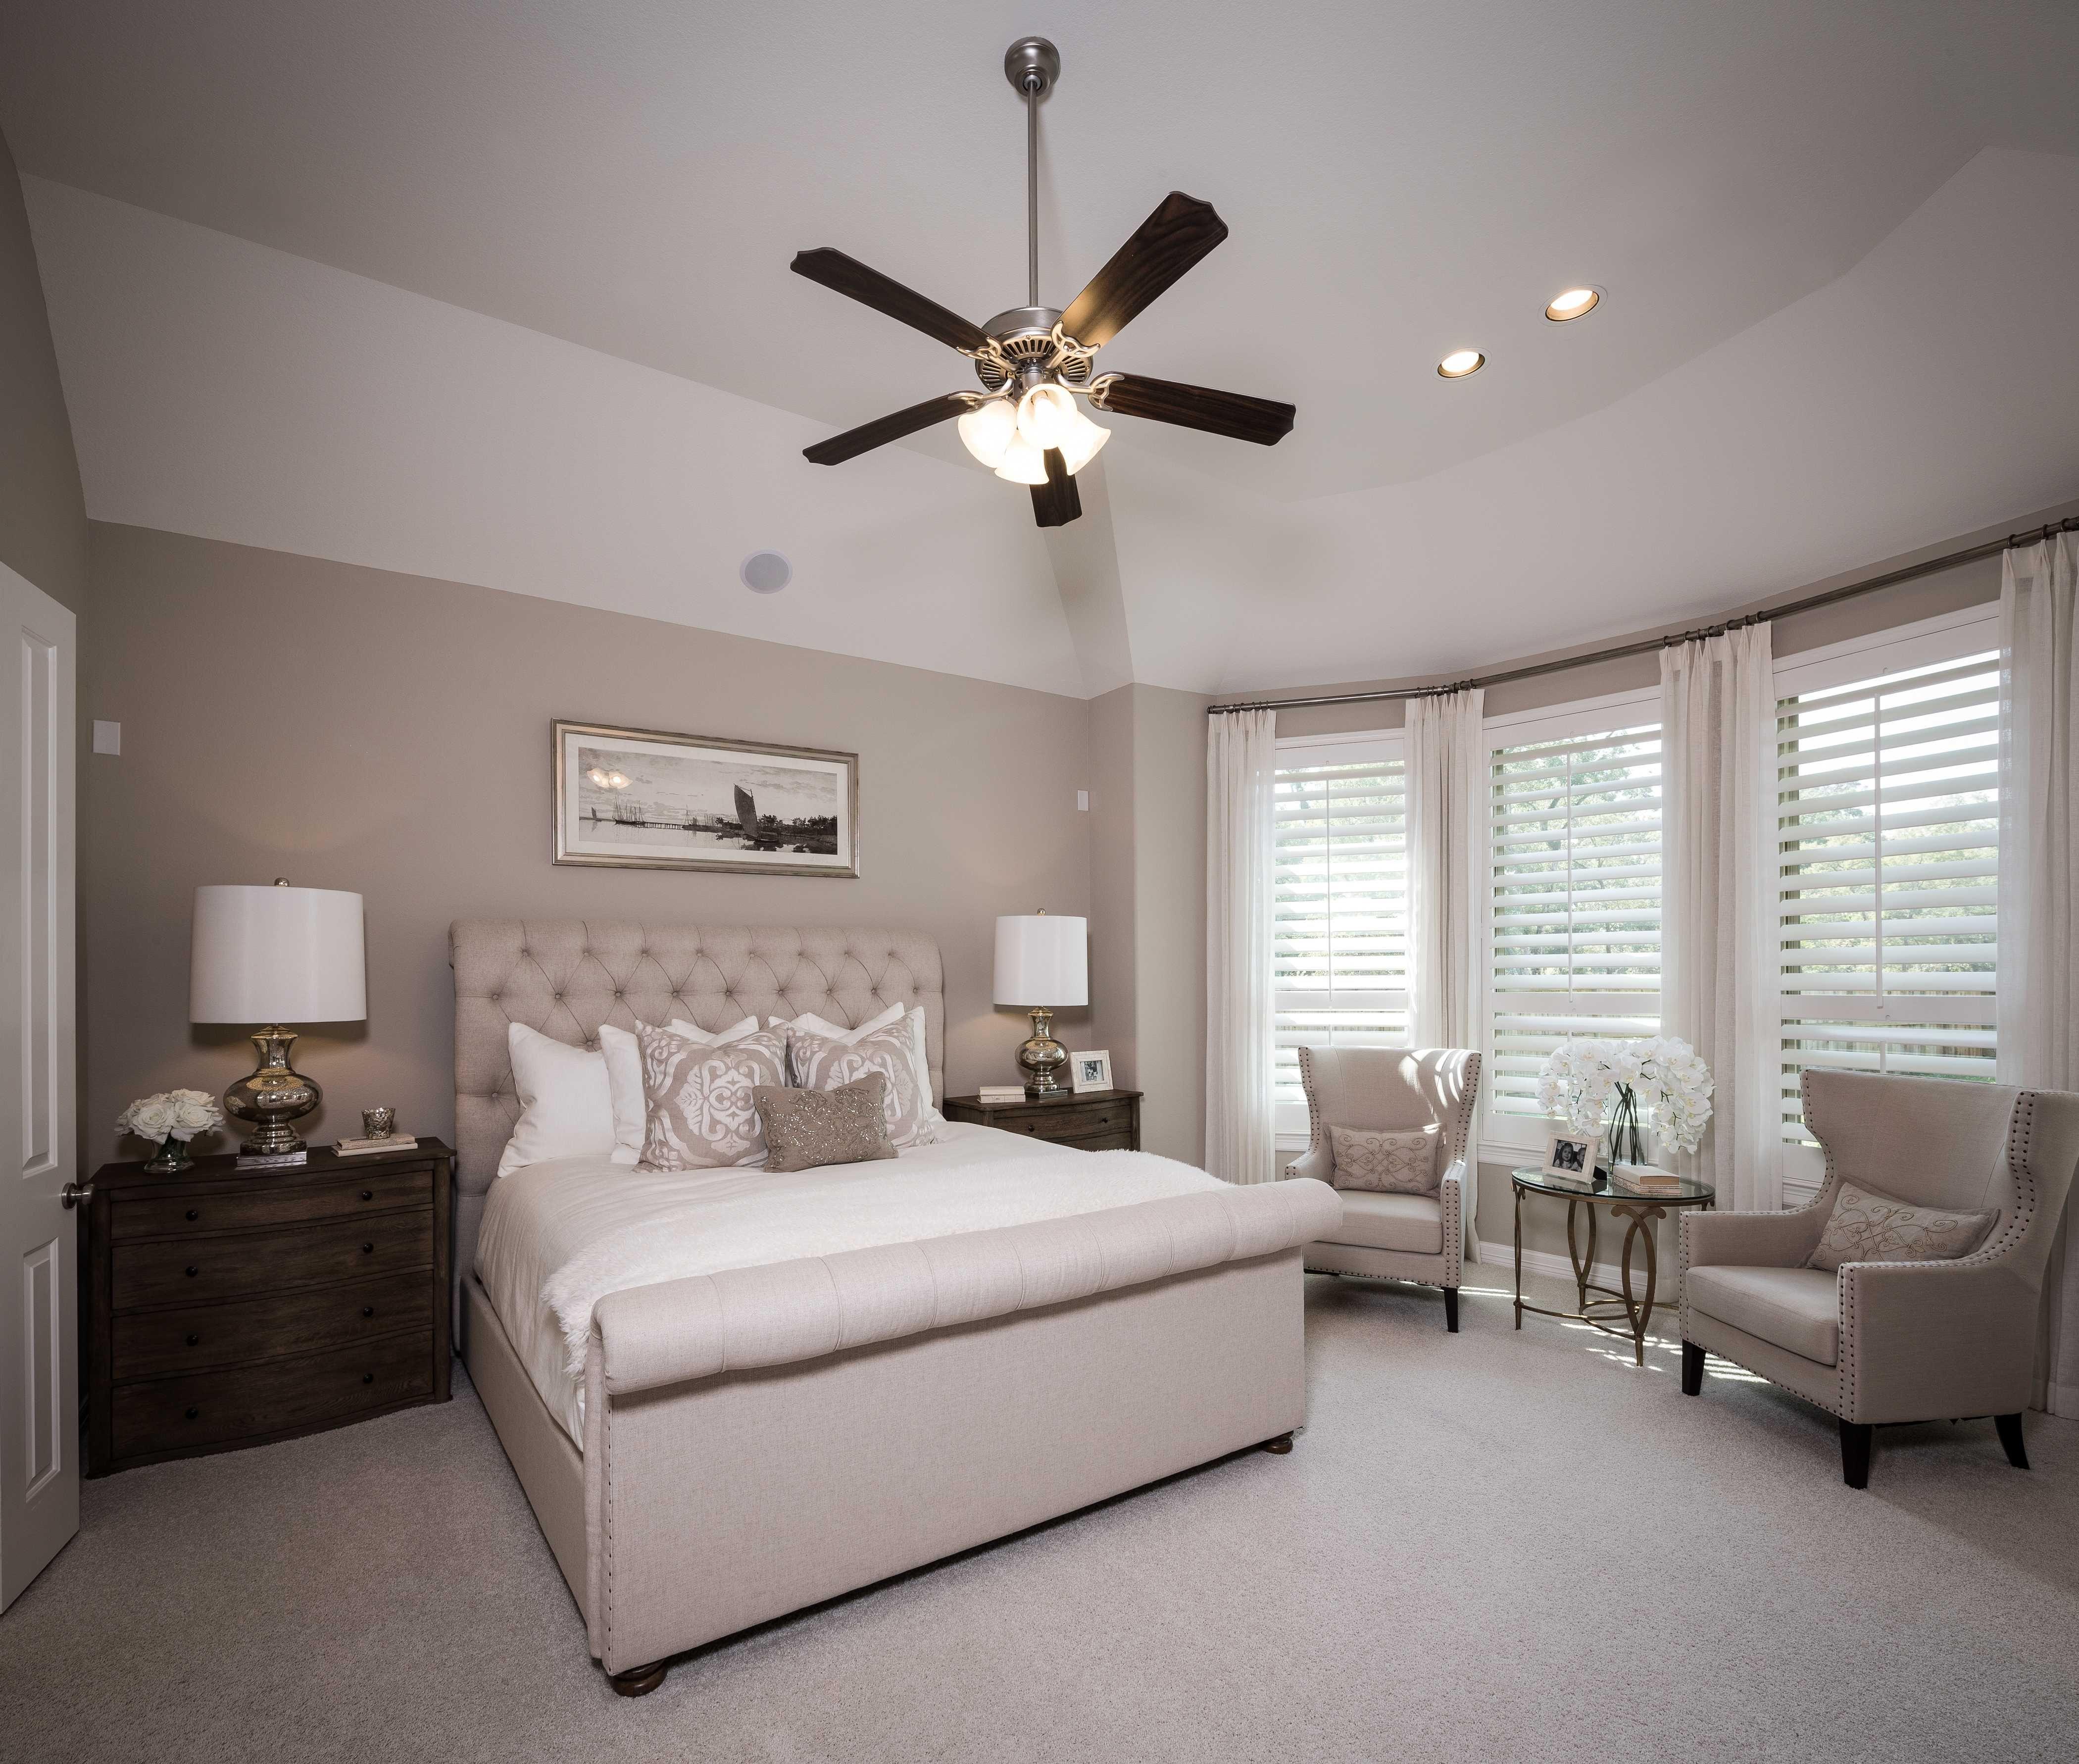 Phillips Creek Ranch Estates, TX Home, Home bedroom